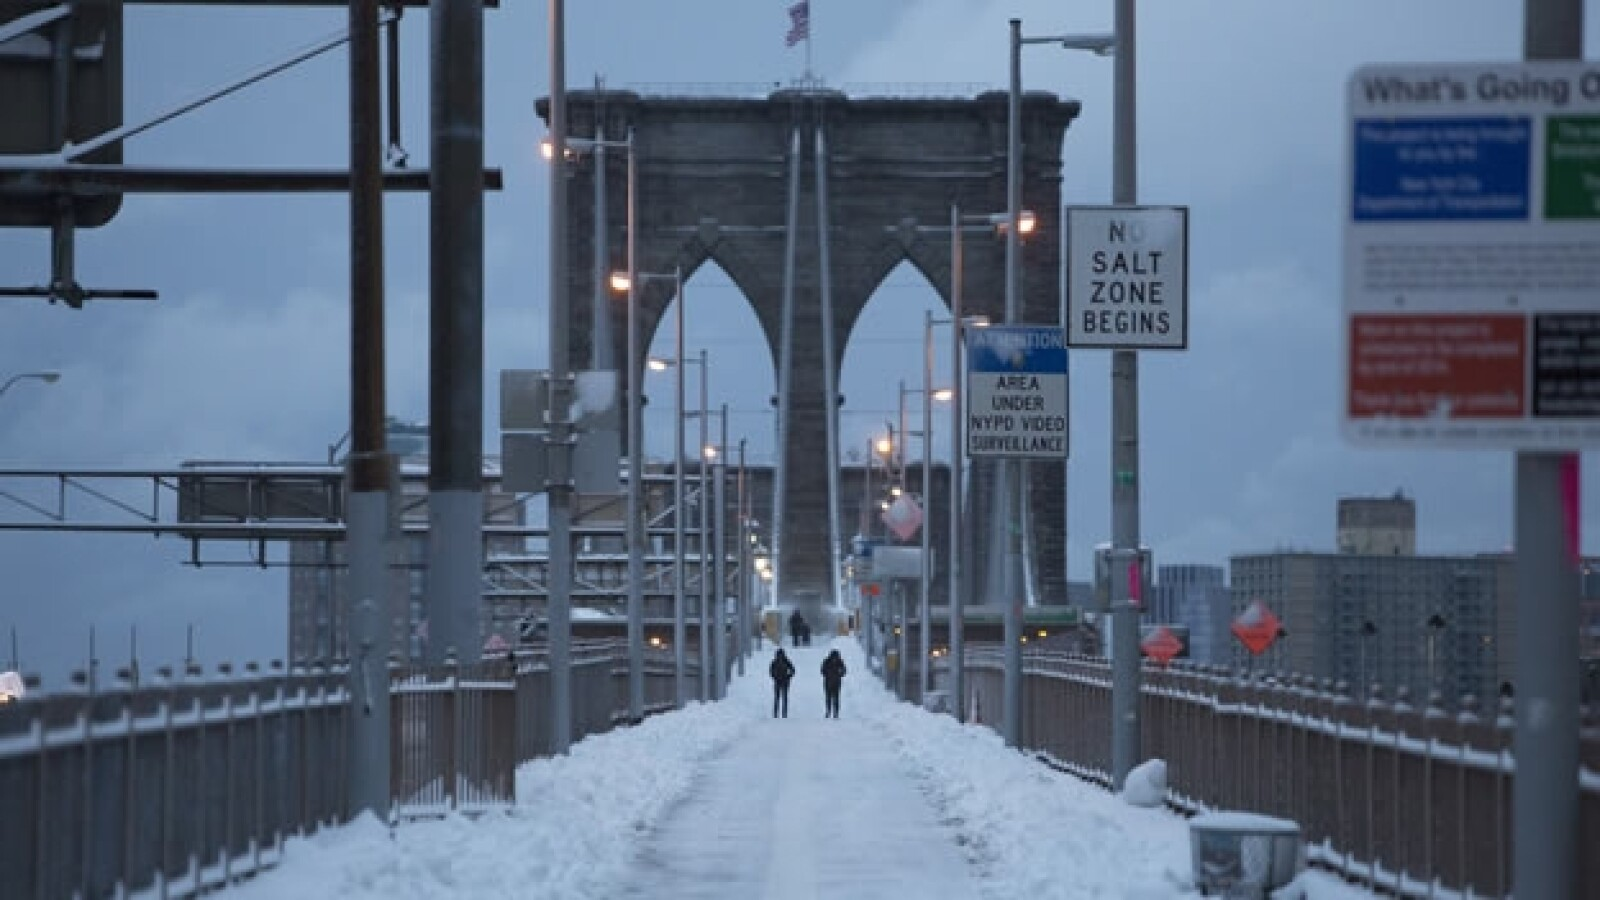 e brooklyn, tormenta invernal